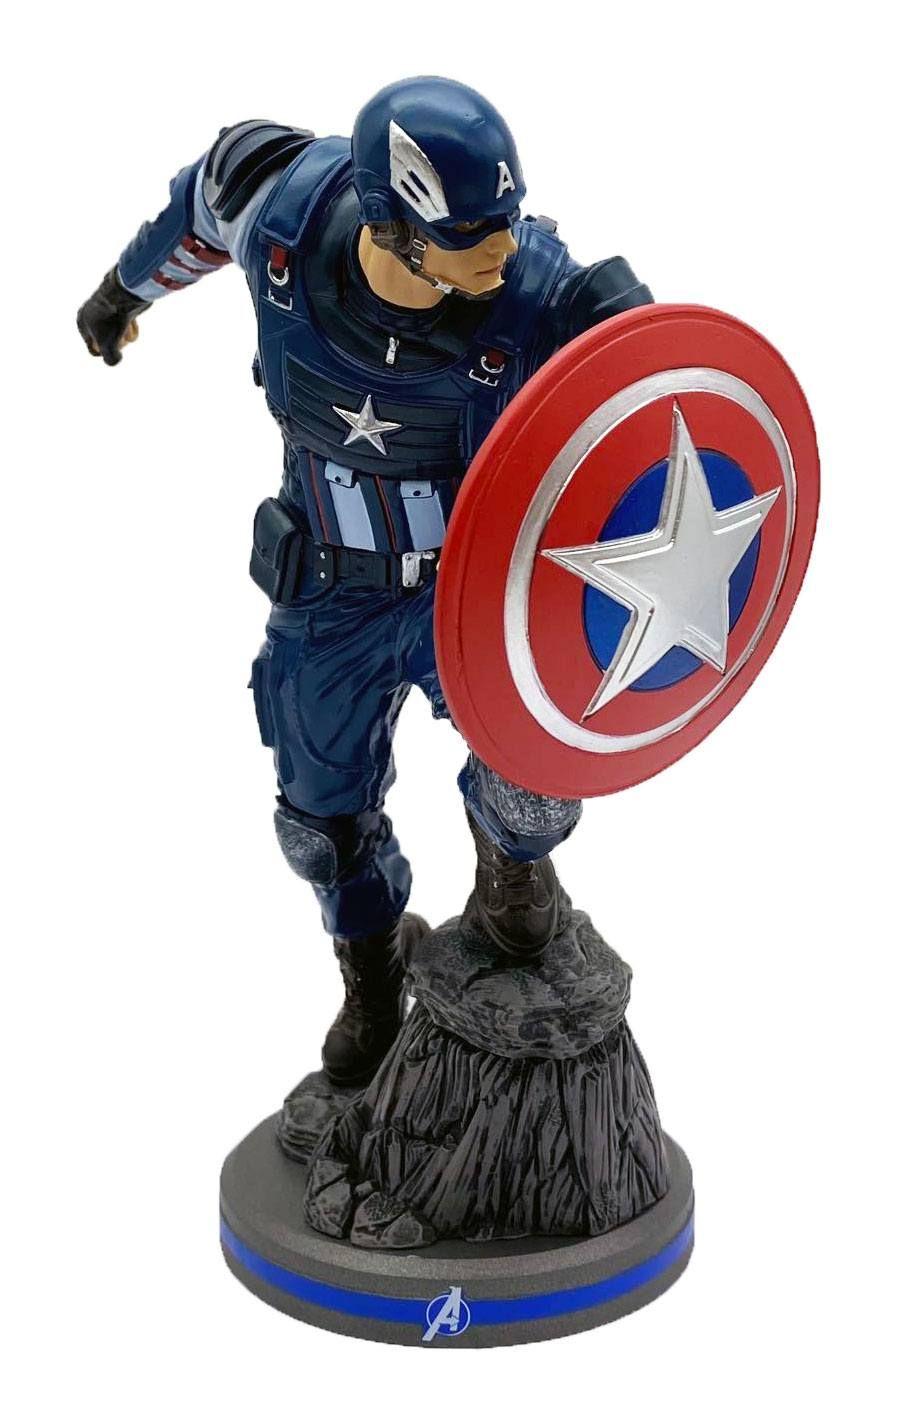 Avengers 2020 Video Game PVC Soška 1/10 Captain America 22 cm Pop Culture Shock